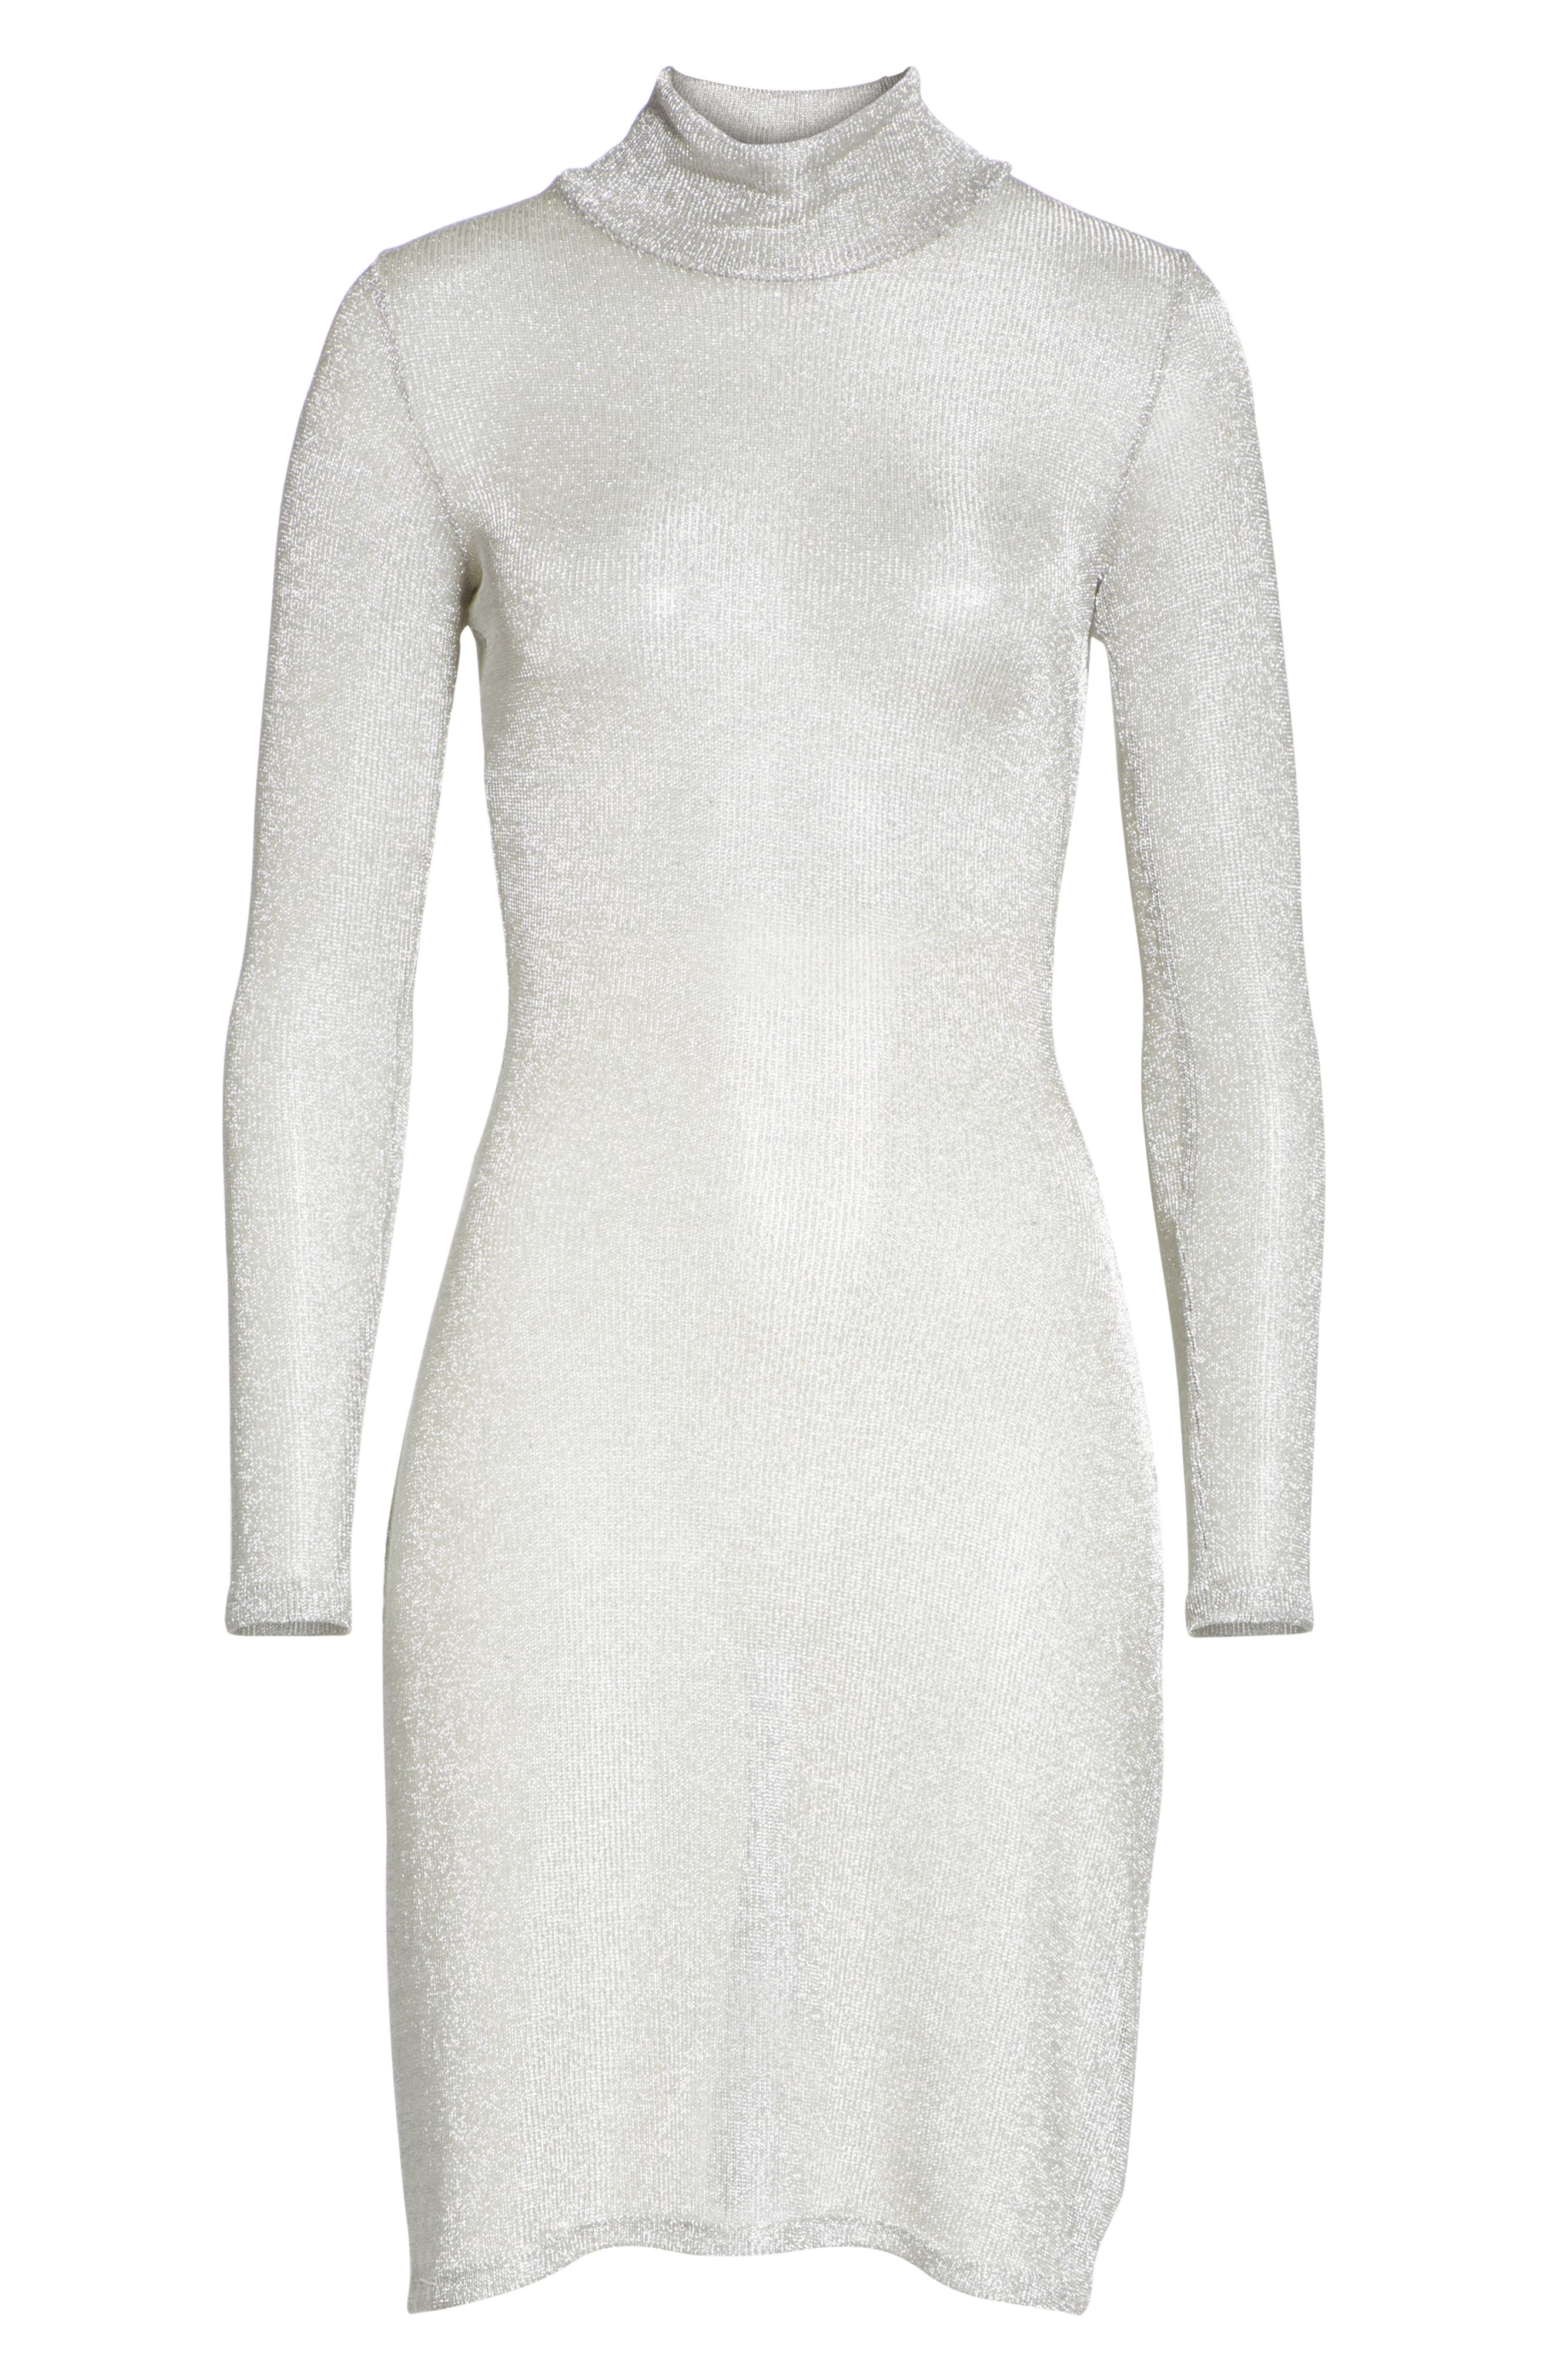 Metallic Rib Turtleneck Dress,                             Alternate thumbnail 8, color,                             SM - SILVER MESH